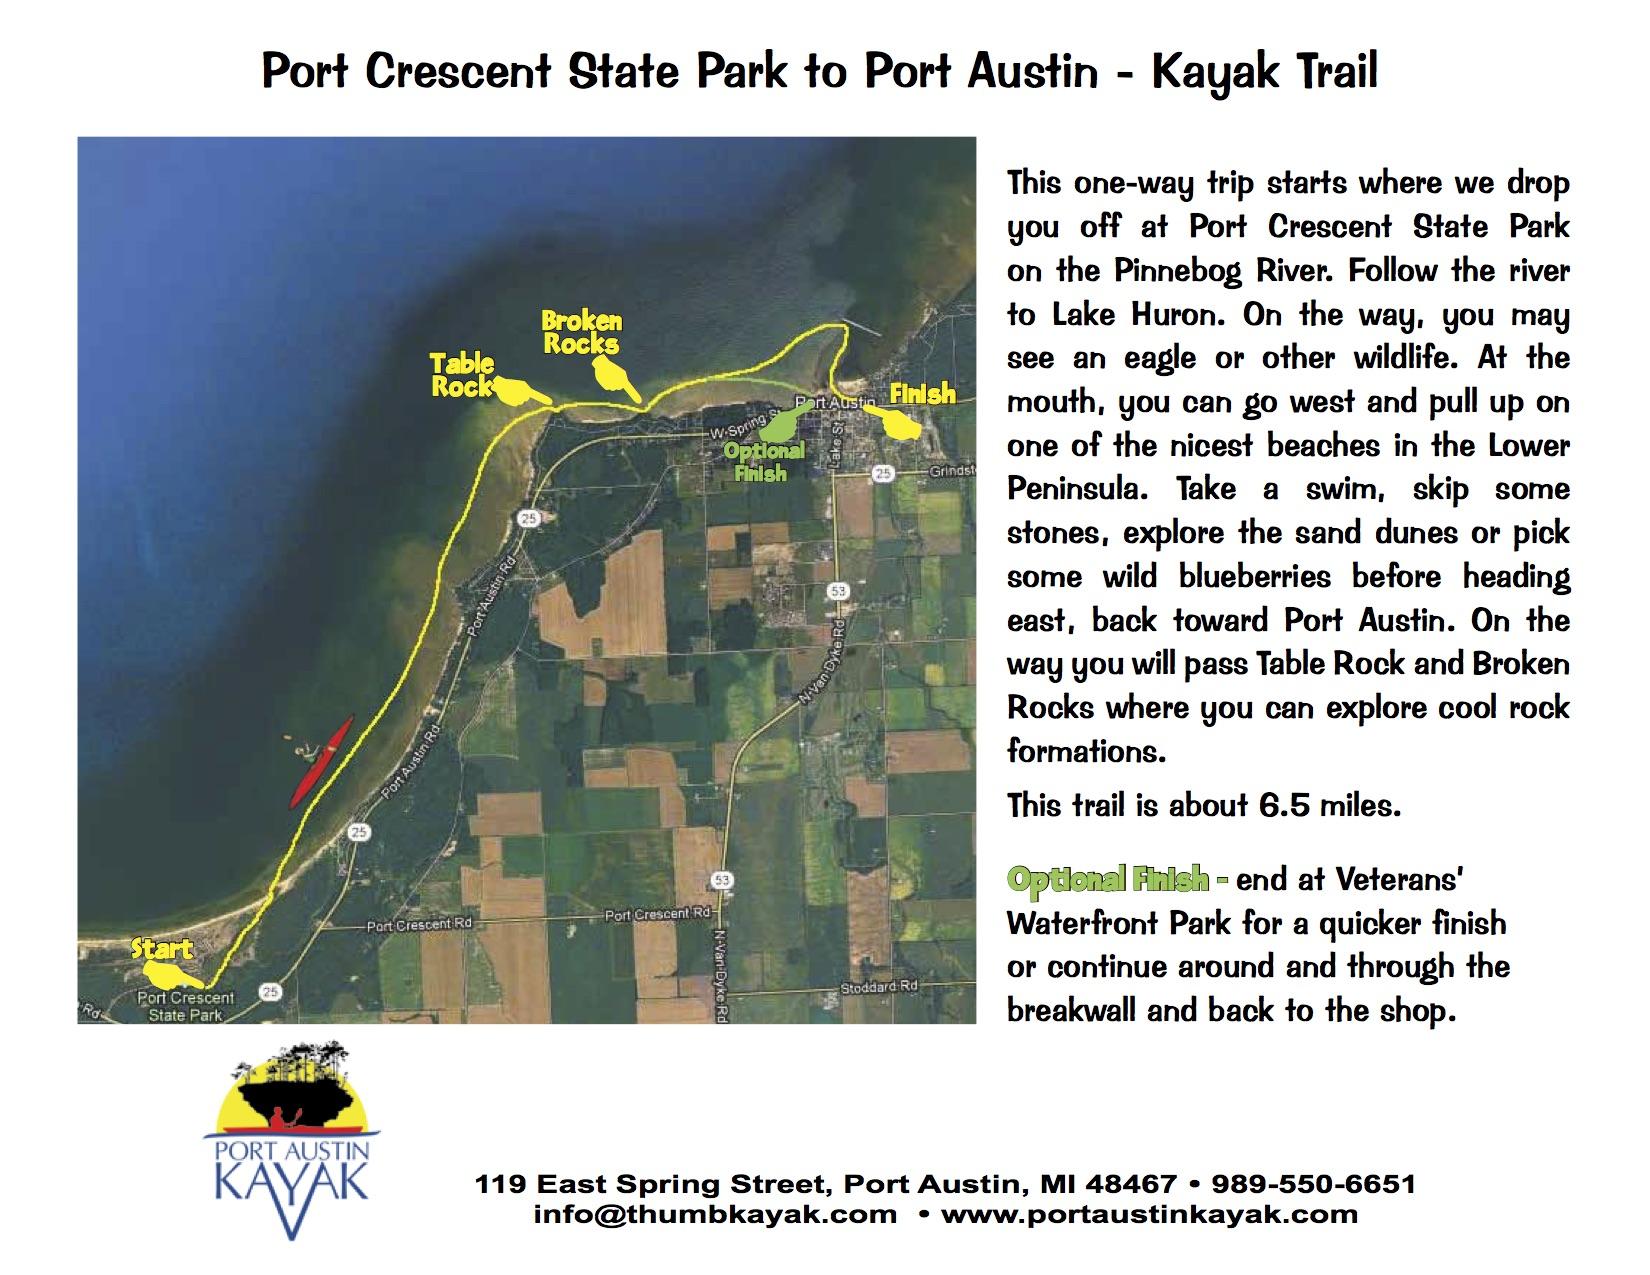 Port Crescent State Park to Port Austin Trail Map.jpg